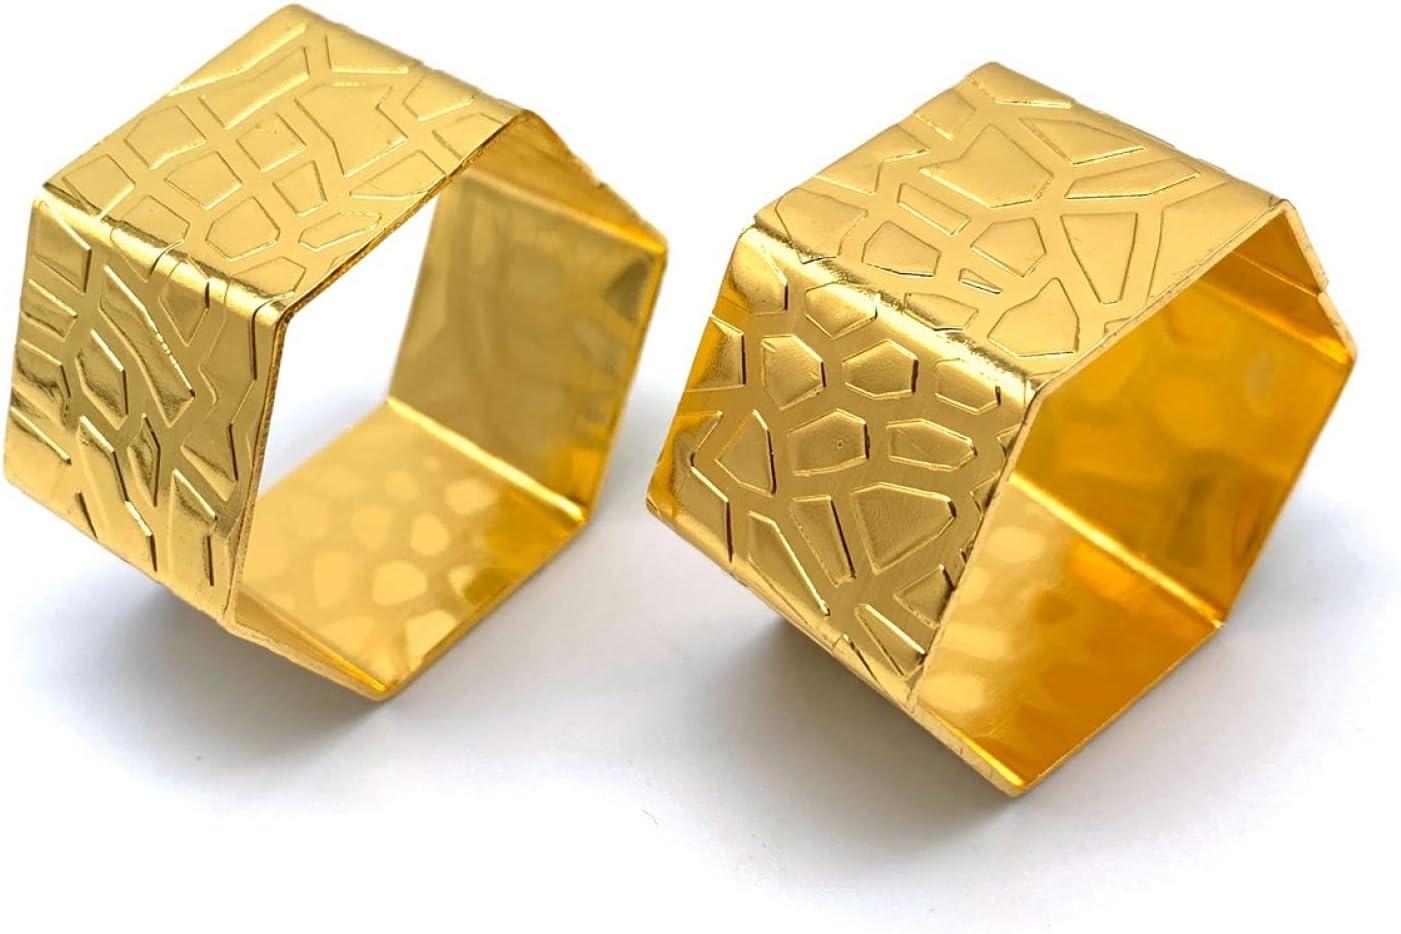 2 Pcs Hexagon Popular brand Napkin Ring Holder OFFicial store Buckle Metal St